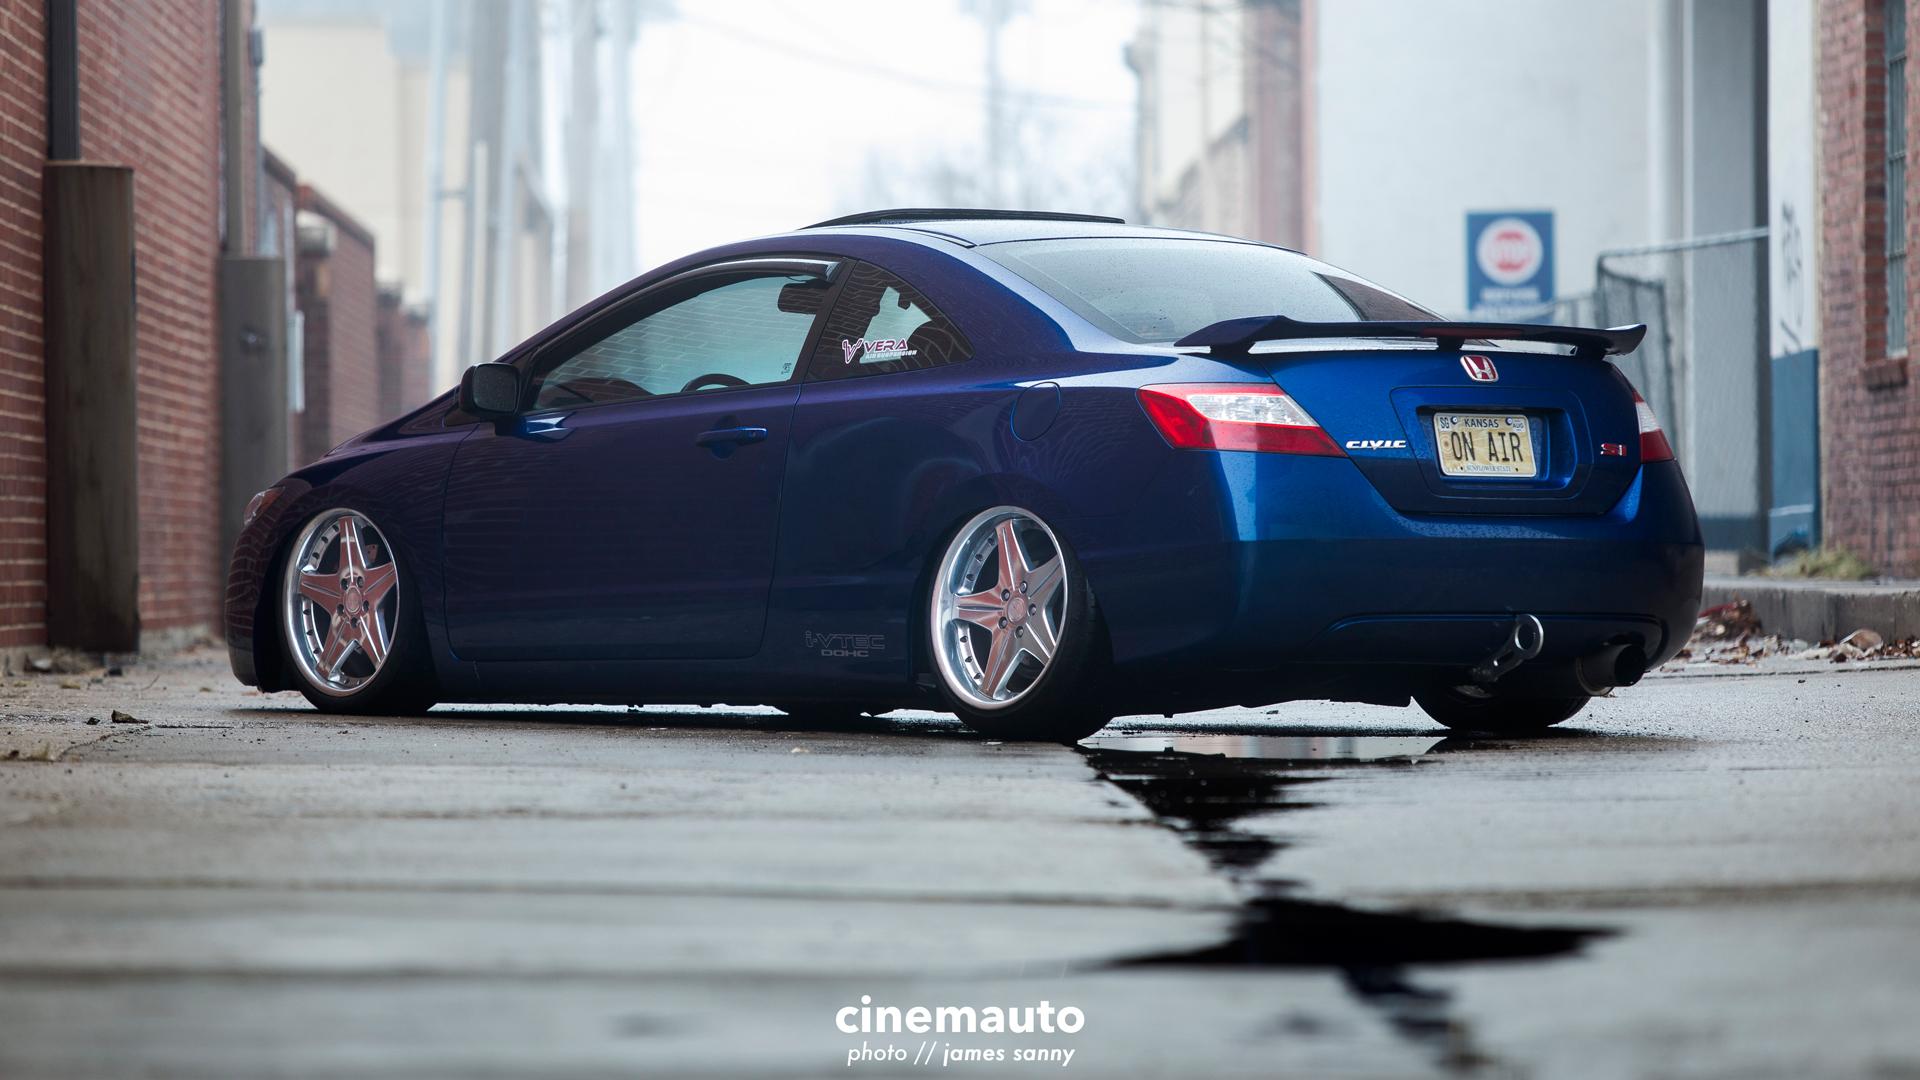 wichita-automotive-photographer-james-sanny-cinemauto-km9.jpg